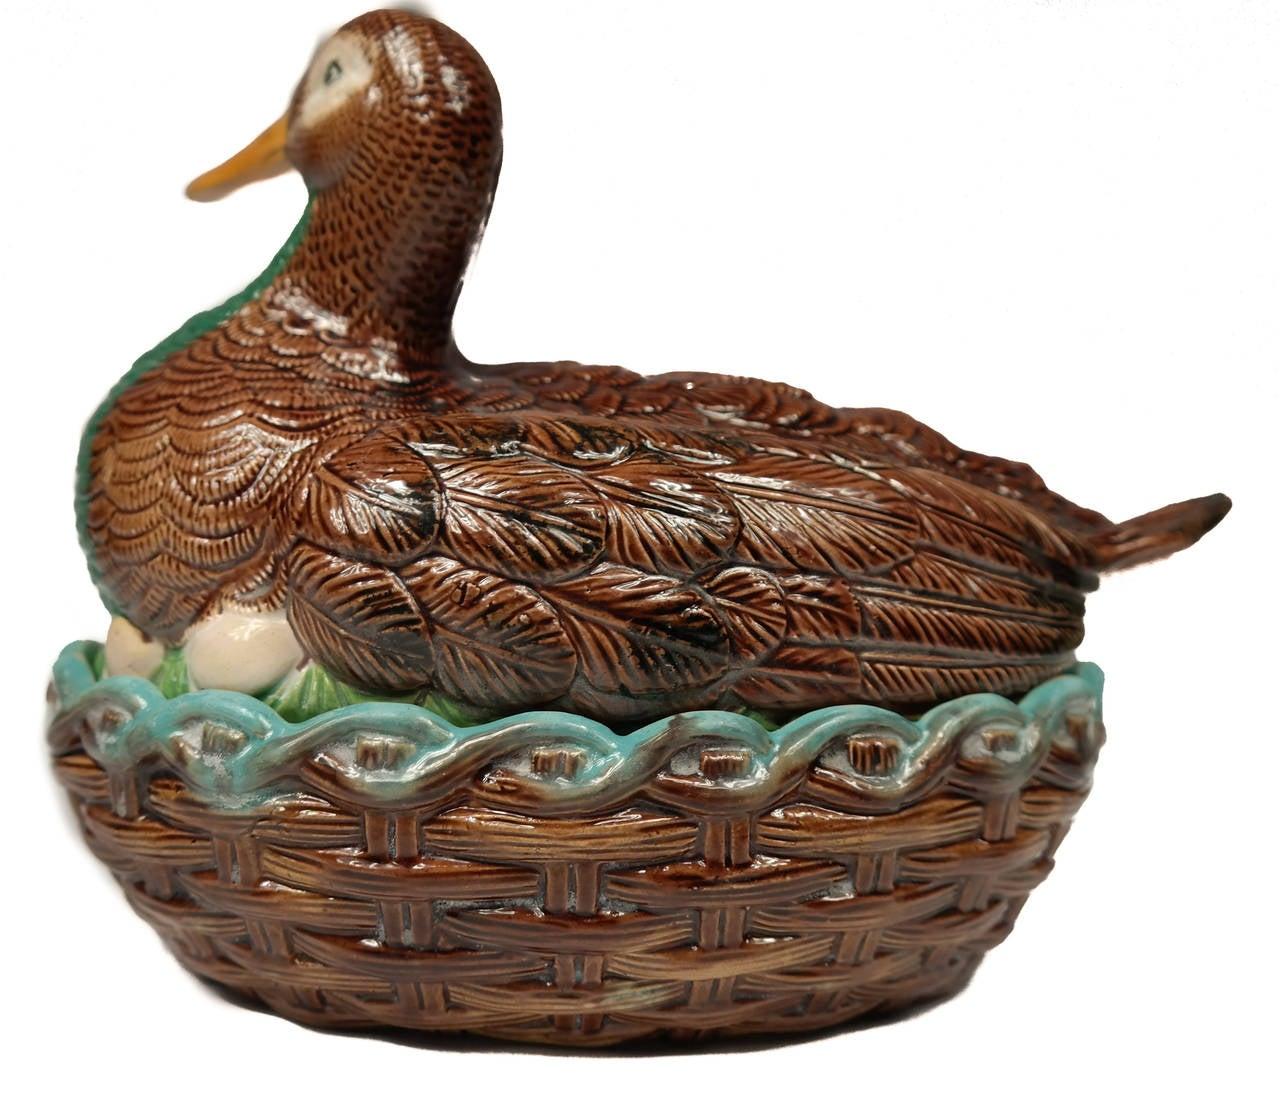 William Brownfield Majolica Duck-on-Nest Tureen In Good Condition In Banner Elk, NC